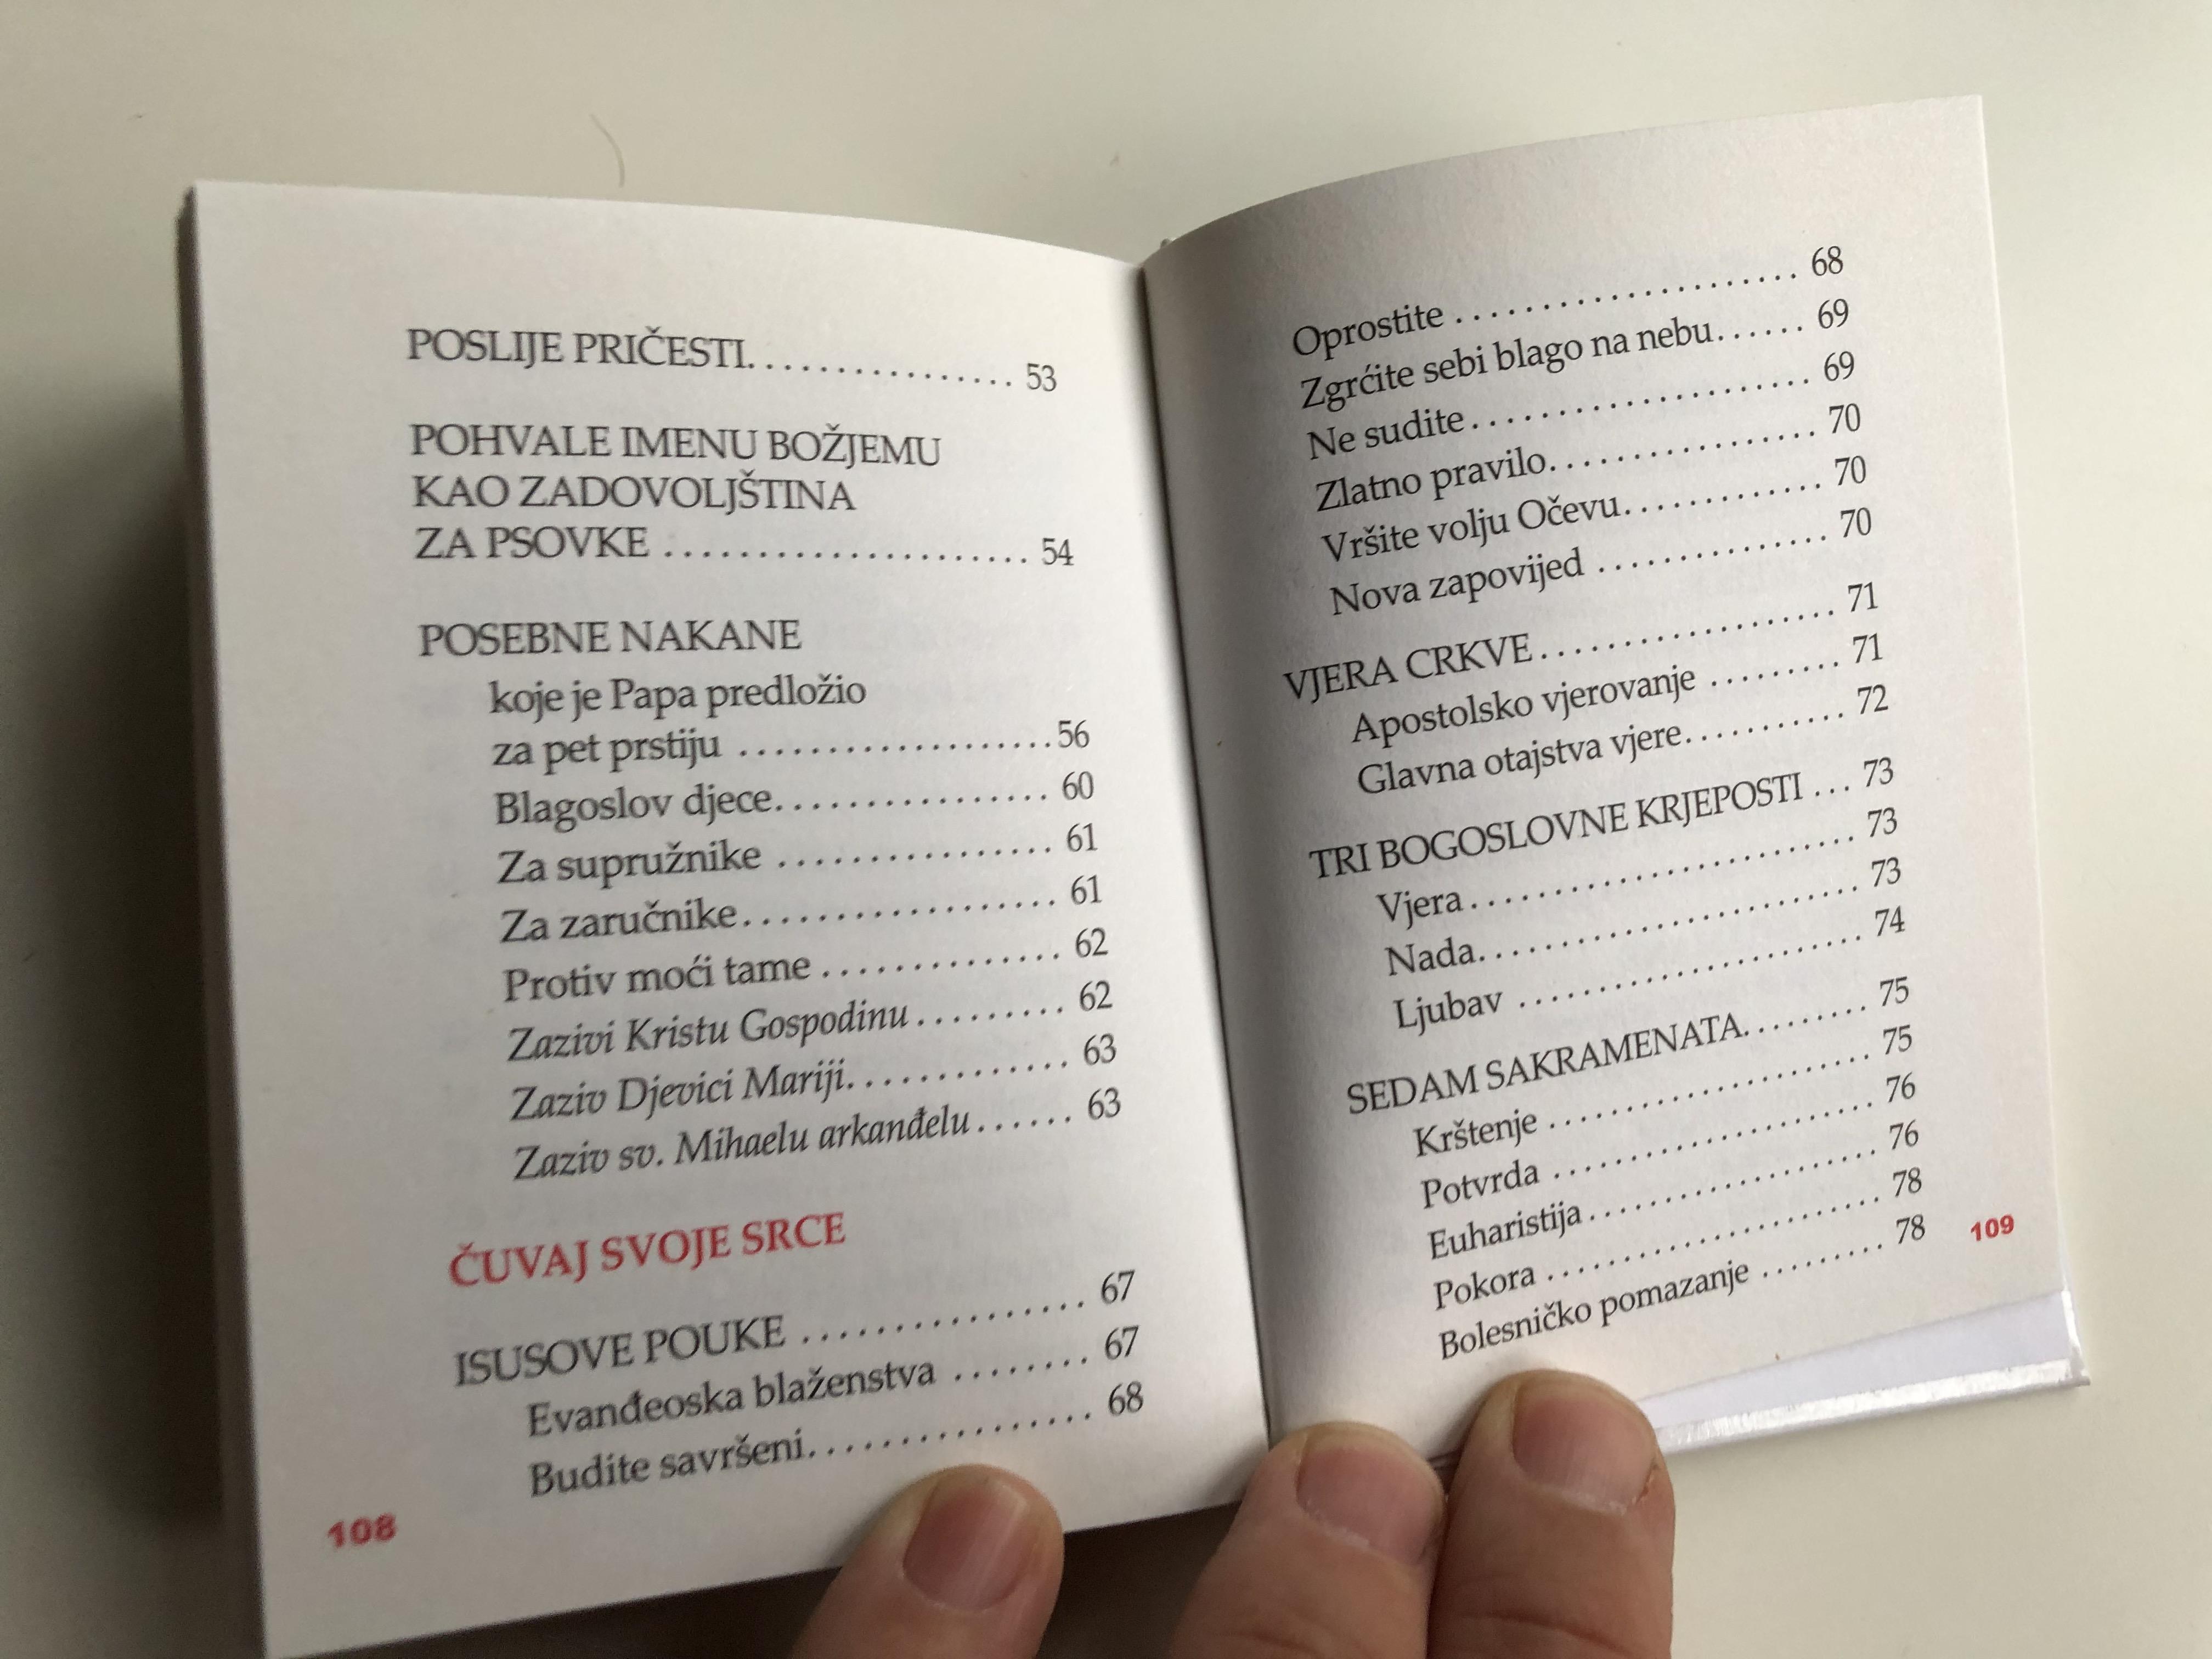 croatian-language-prayer-of-pope-francis-croatian-catholic-prayer-book-small-size-9.jpg